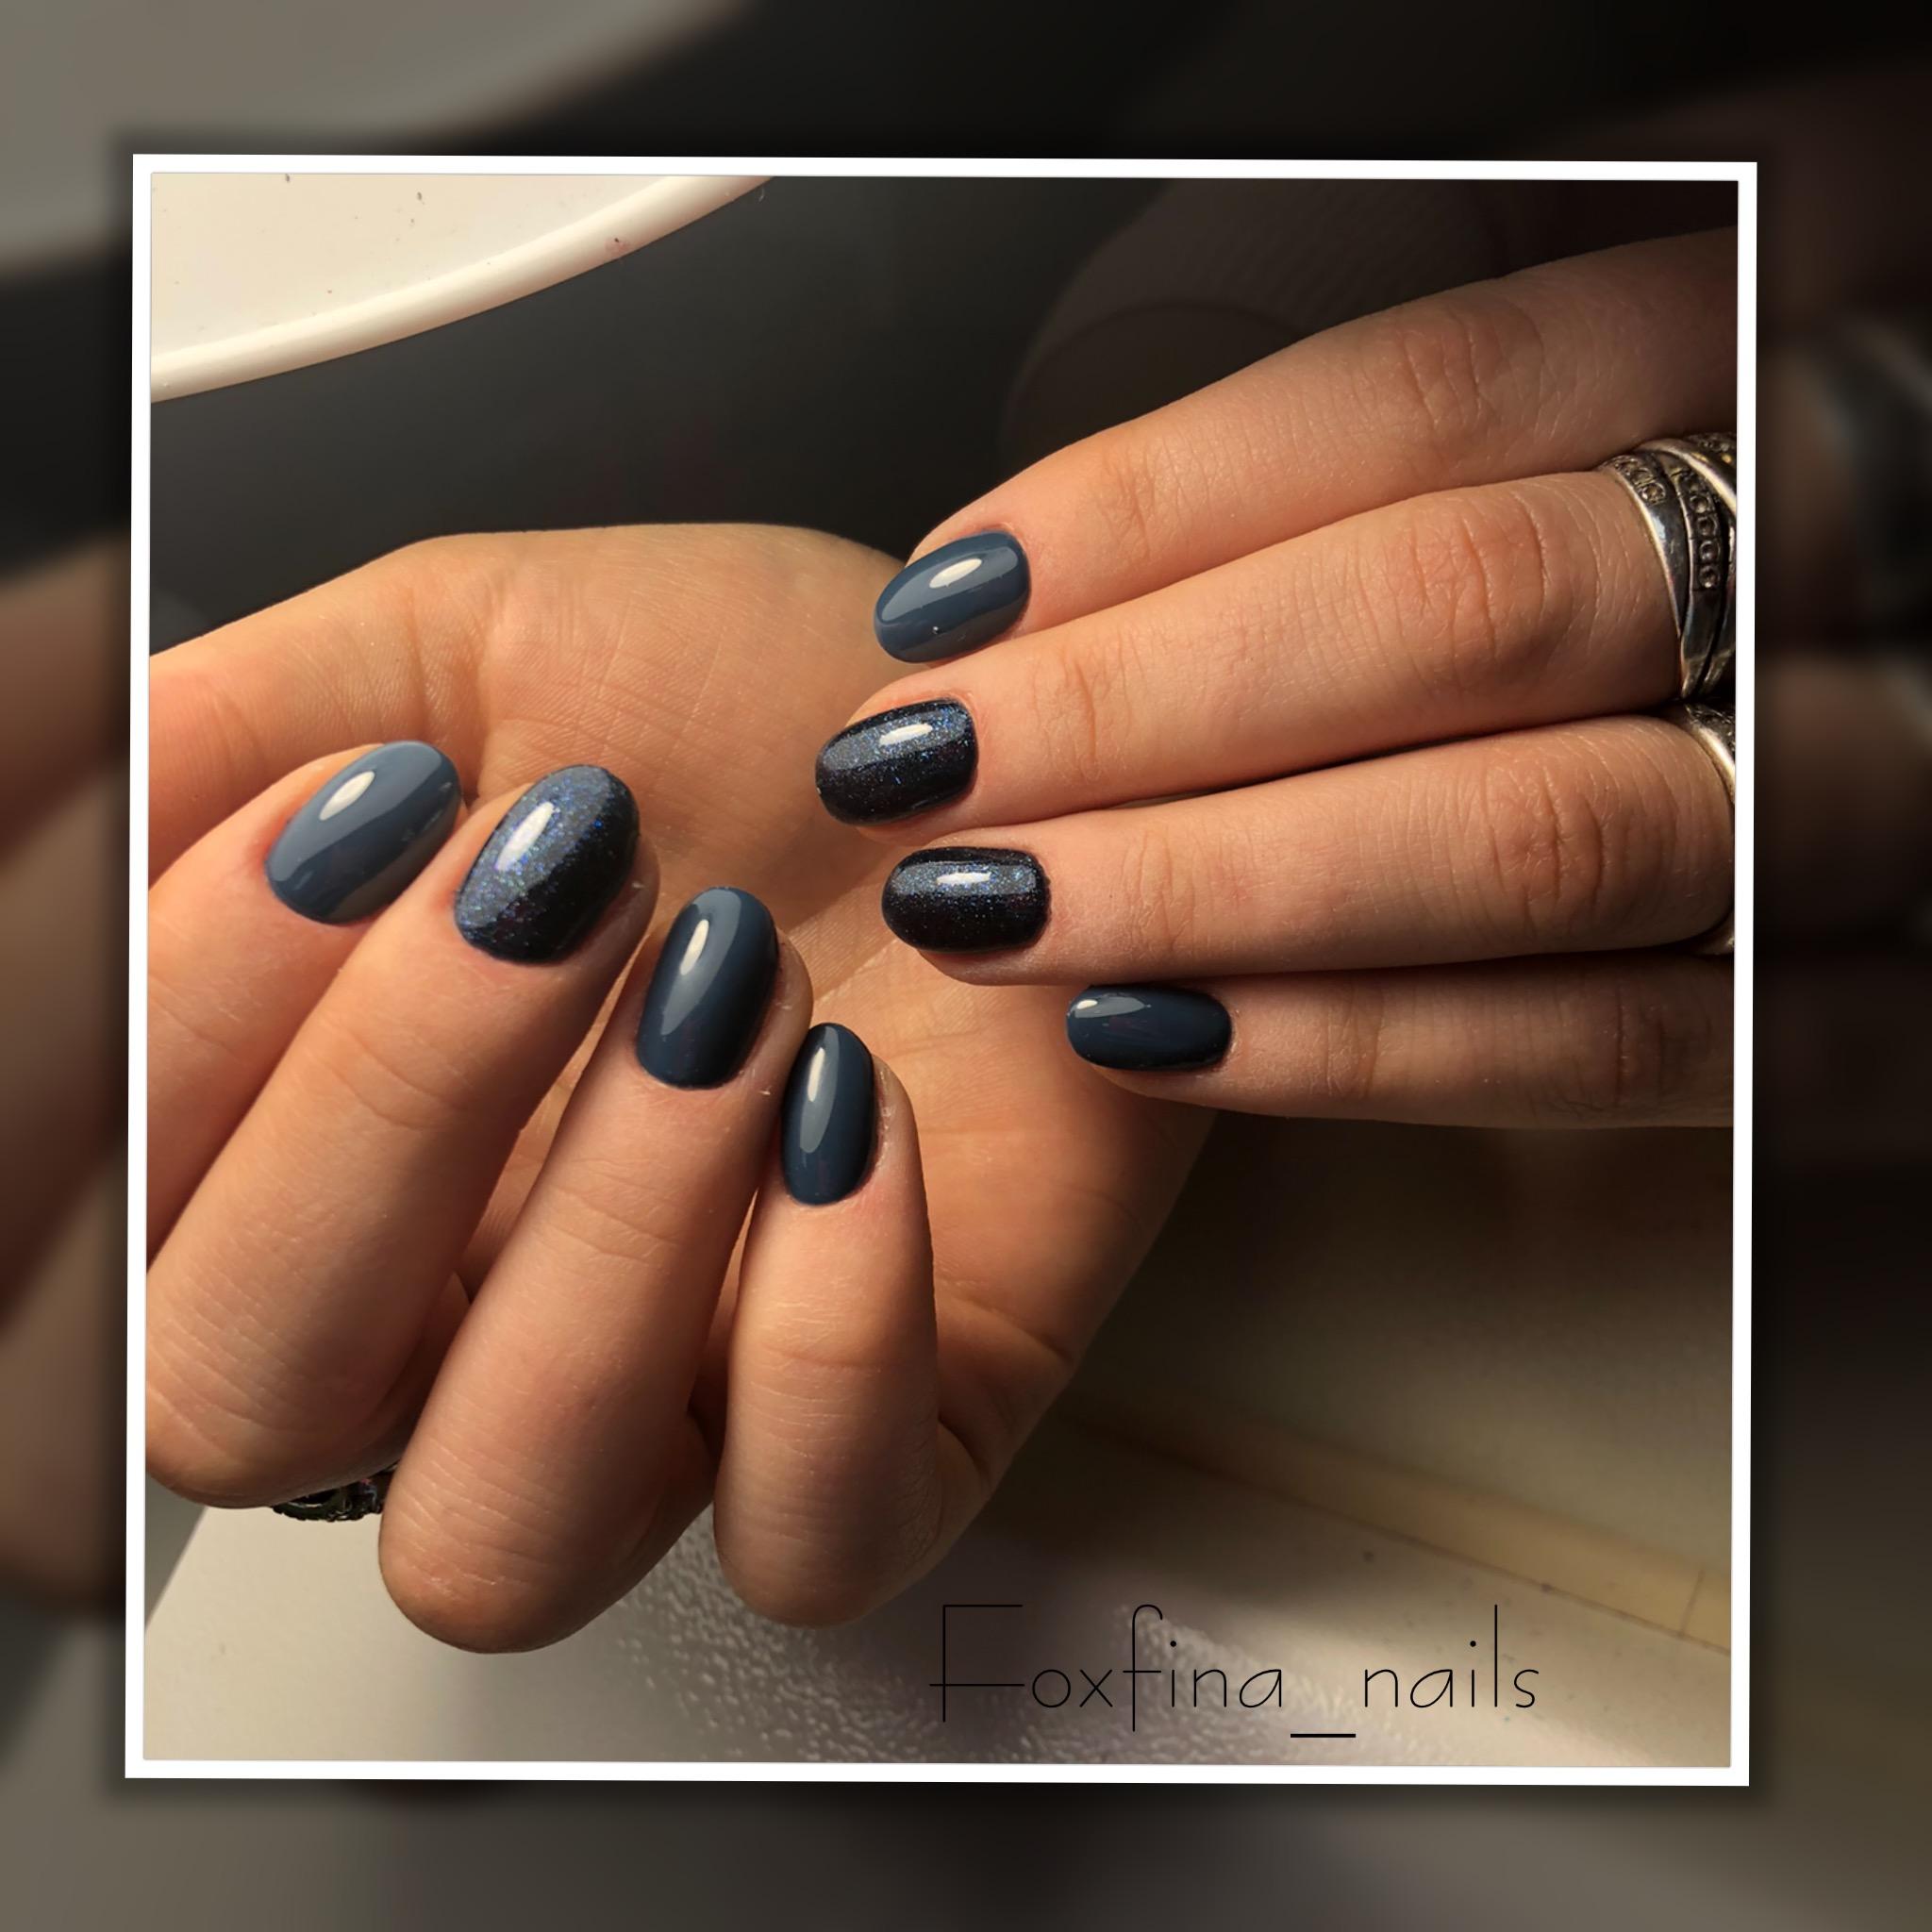 Маникюр с блестками в темно-синем цвете.